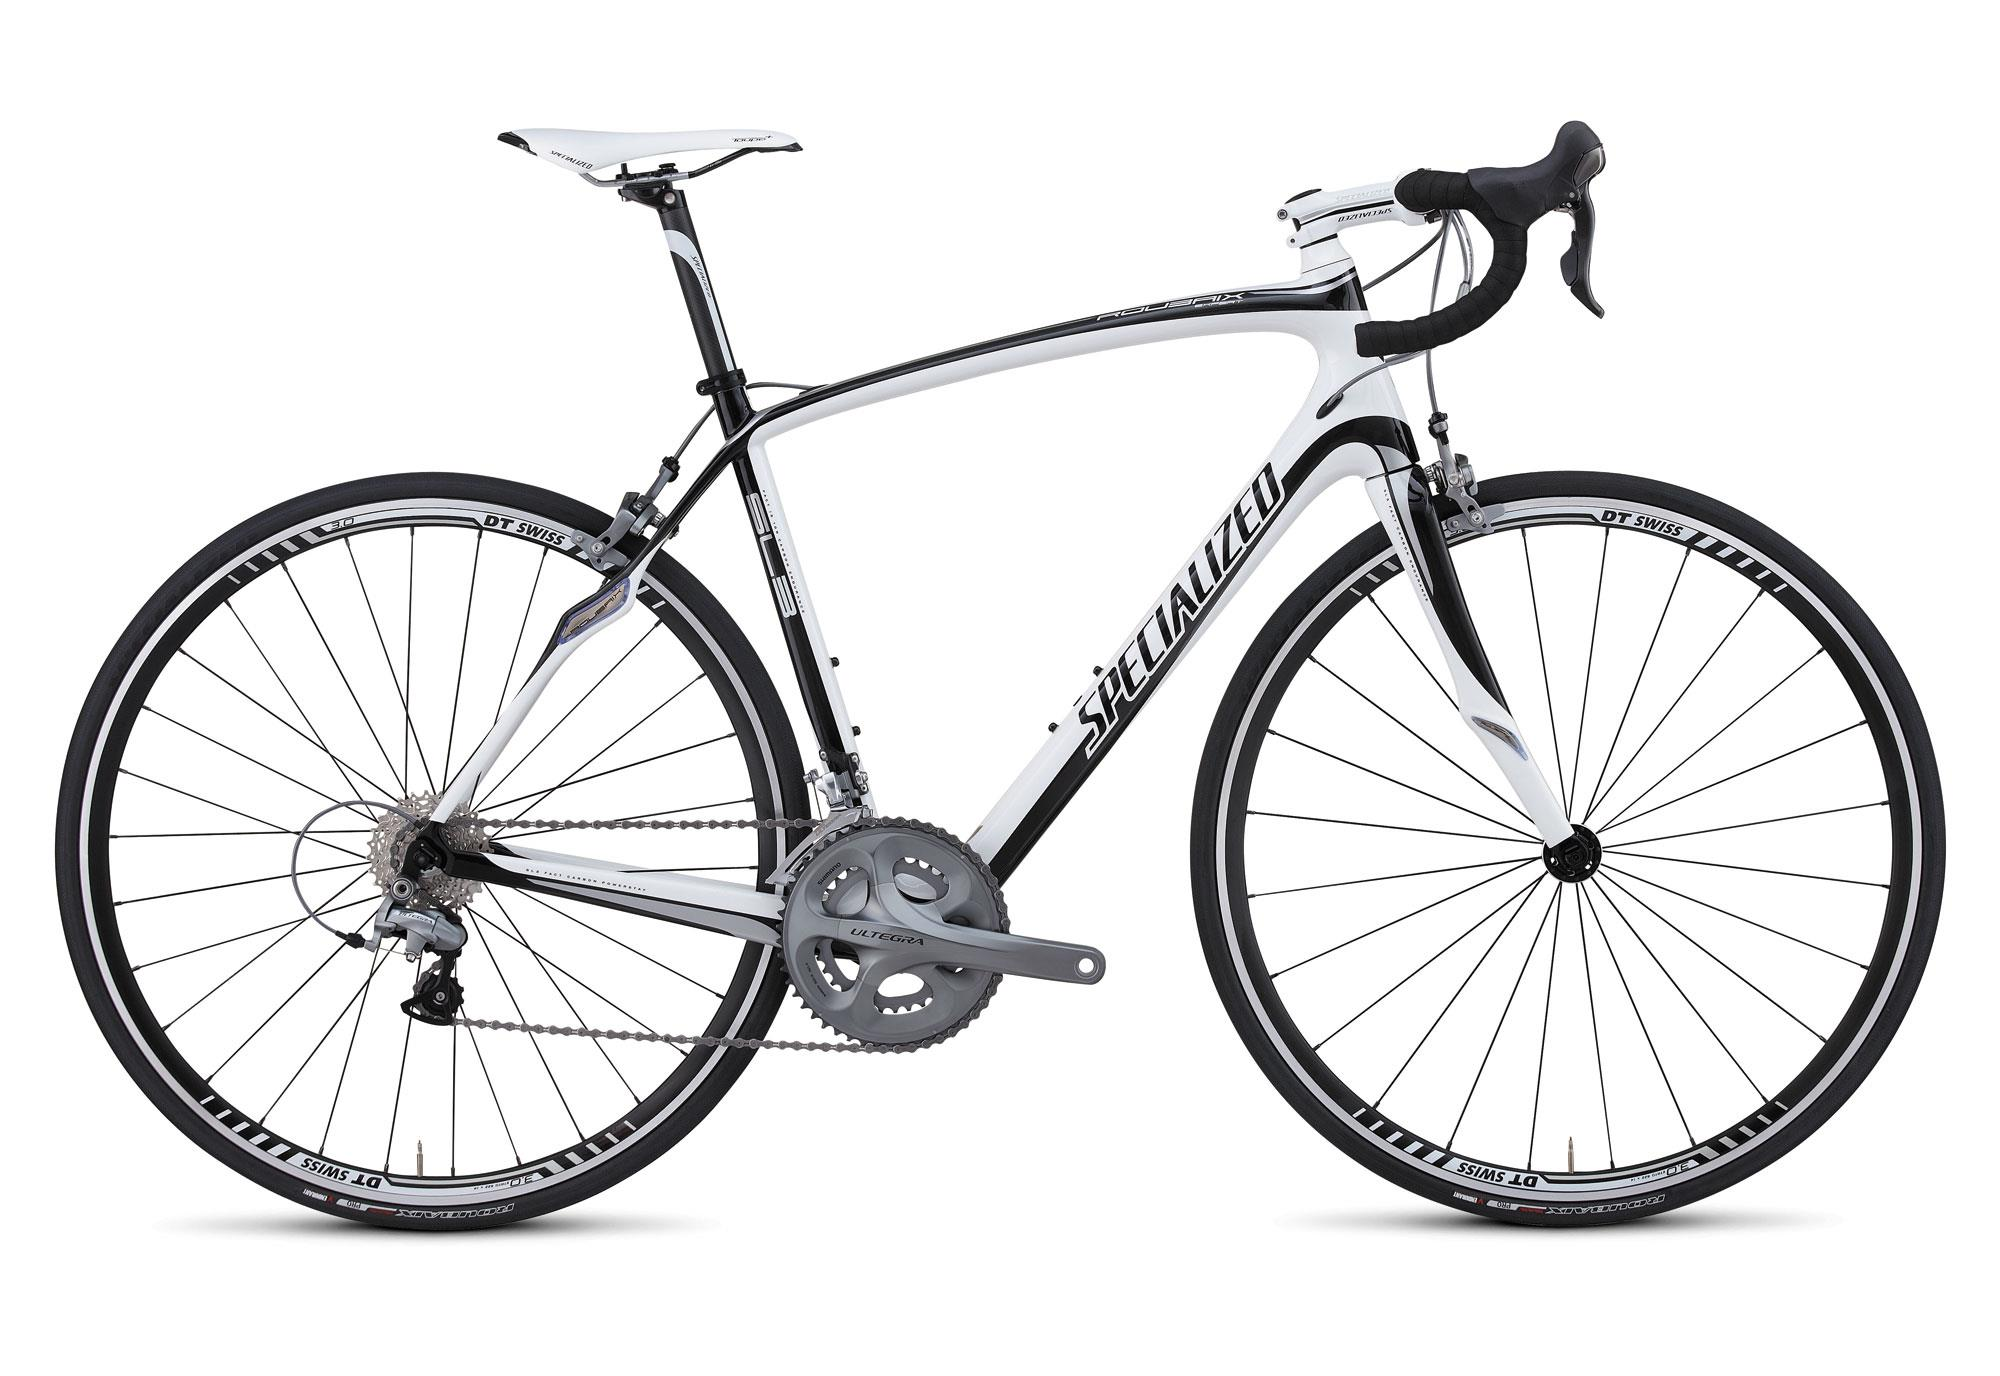 Roubaix SL3 Expert Compact